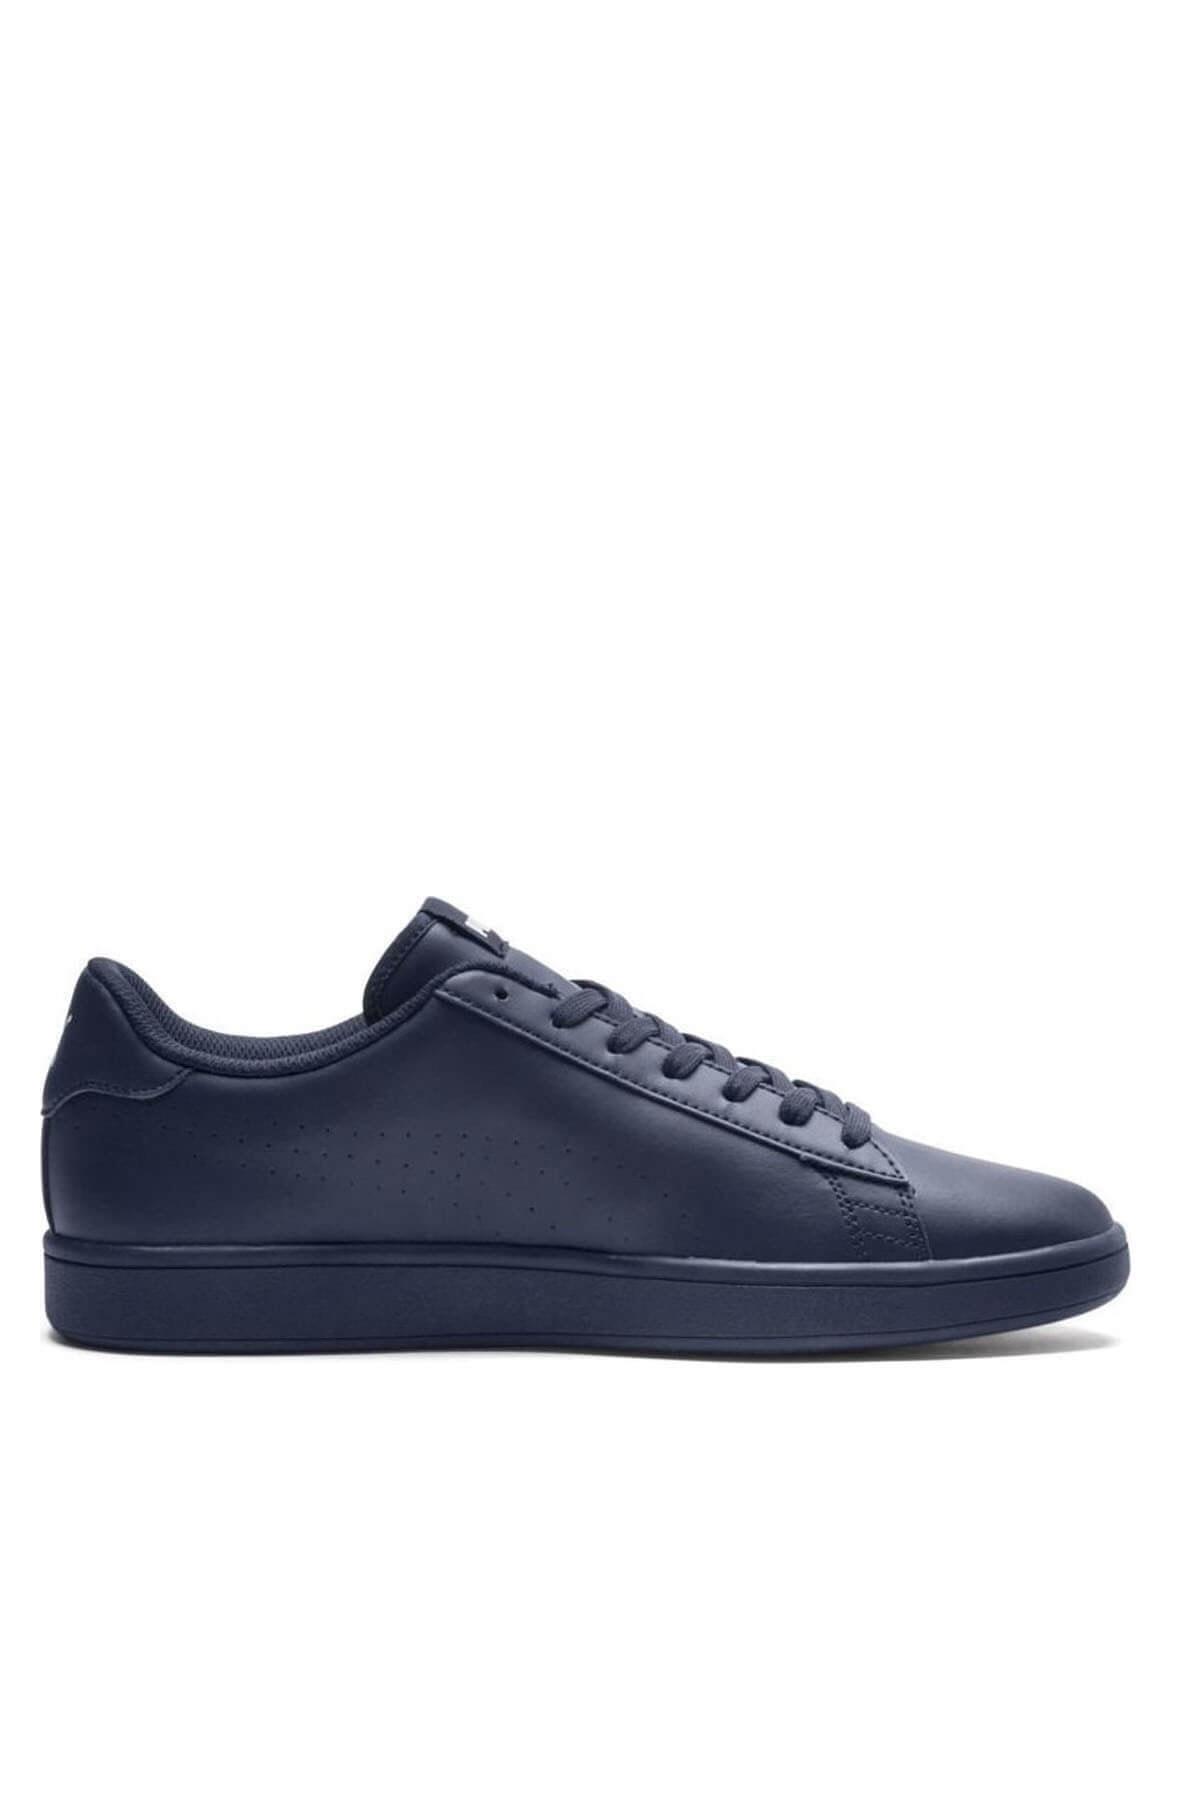 خرید پستی کفش اسپرت طرح Smash شیک برند پوما رنگ لاجوردی کد ty3689978